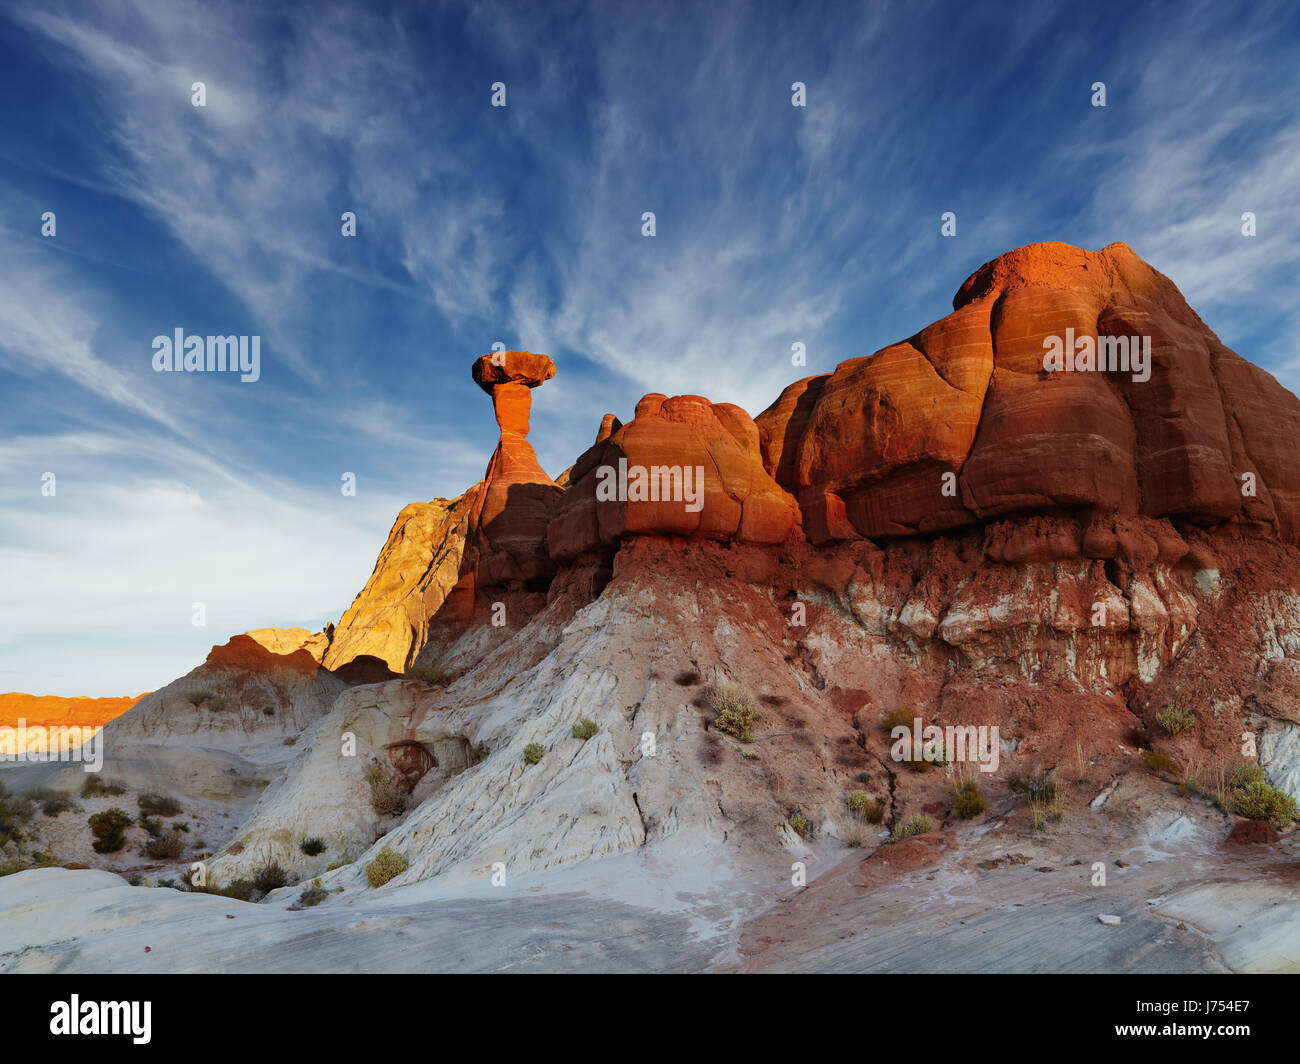 Toadstool Hoodoo rocher en forme de champignon incroyable du désert de l'Utah, USA Photo Stock